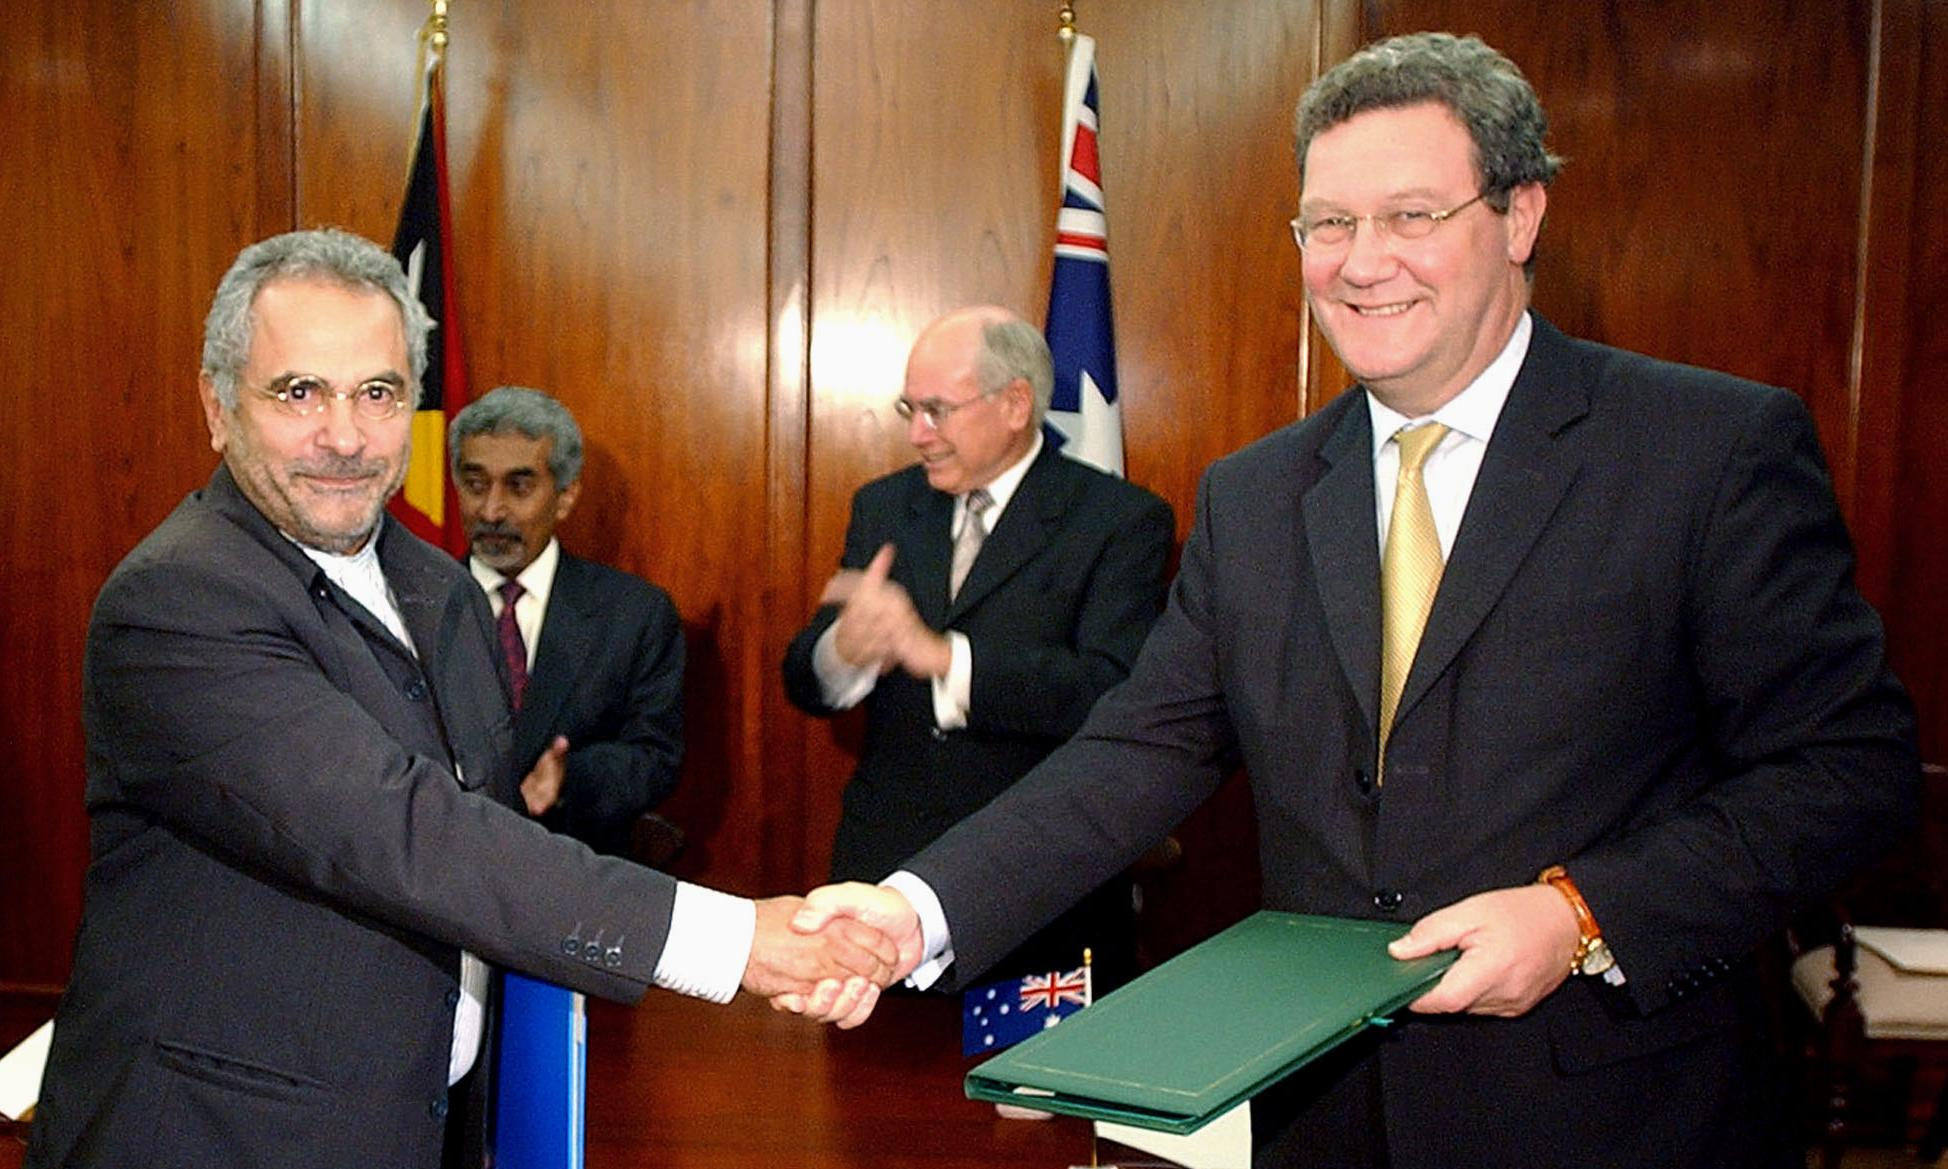 Crossbench senator pushes to fix 'shameful' historic wrong against Timor-Leste